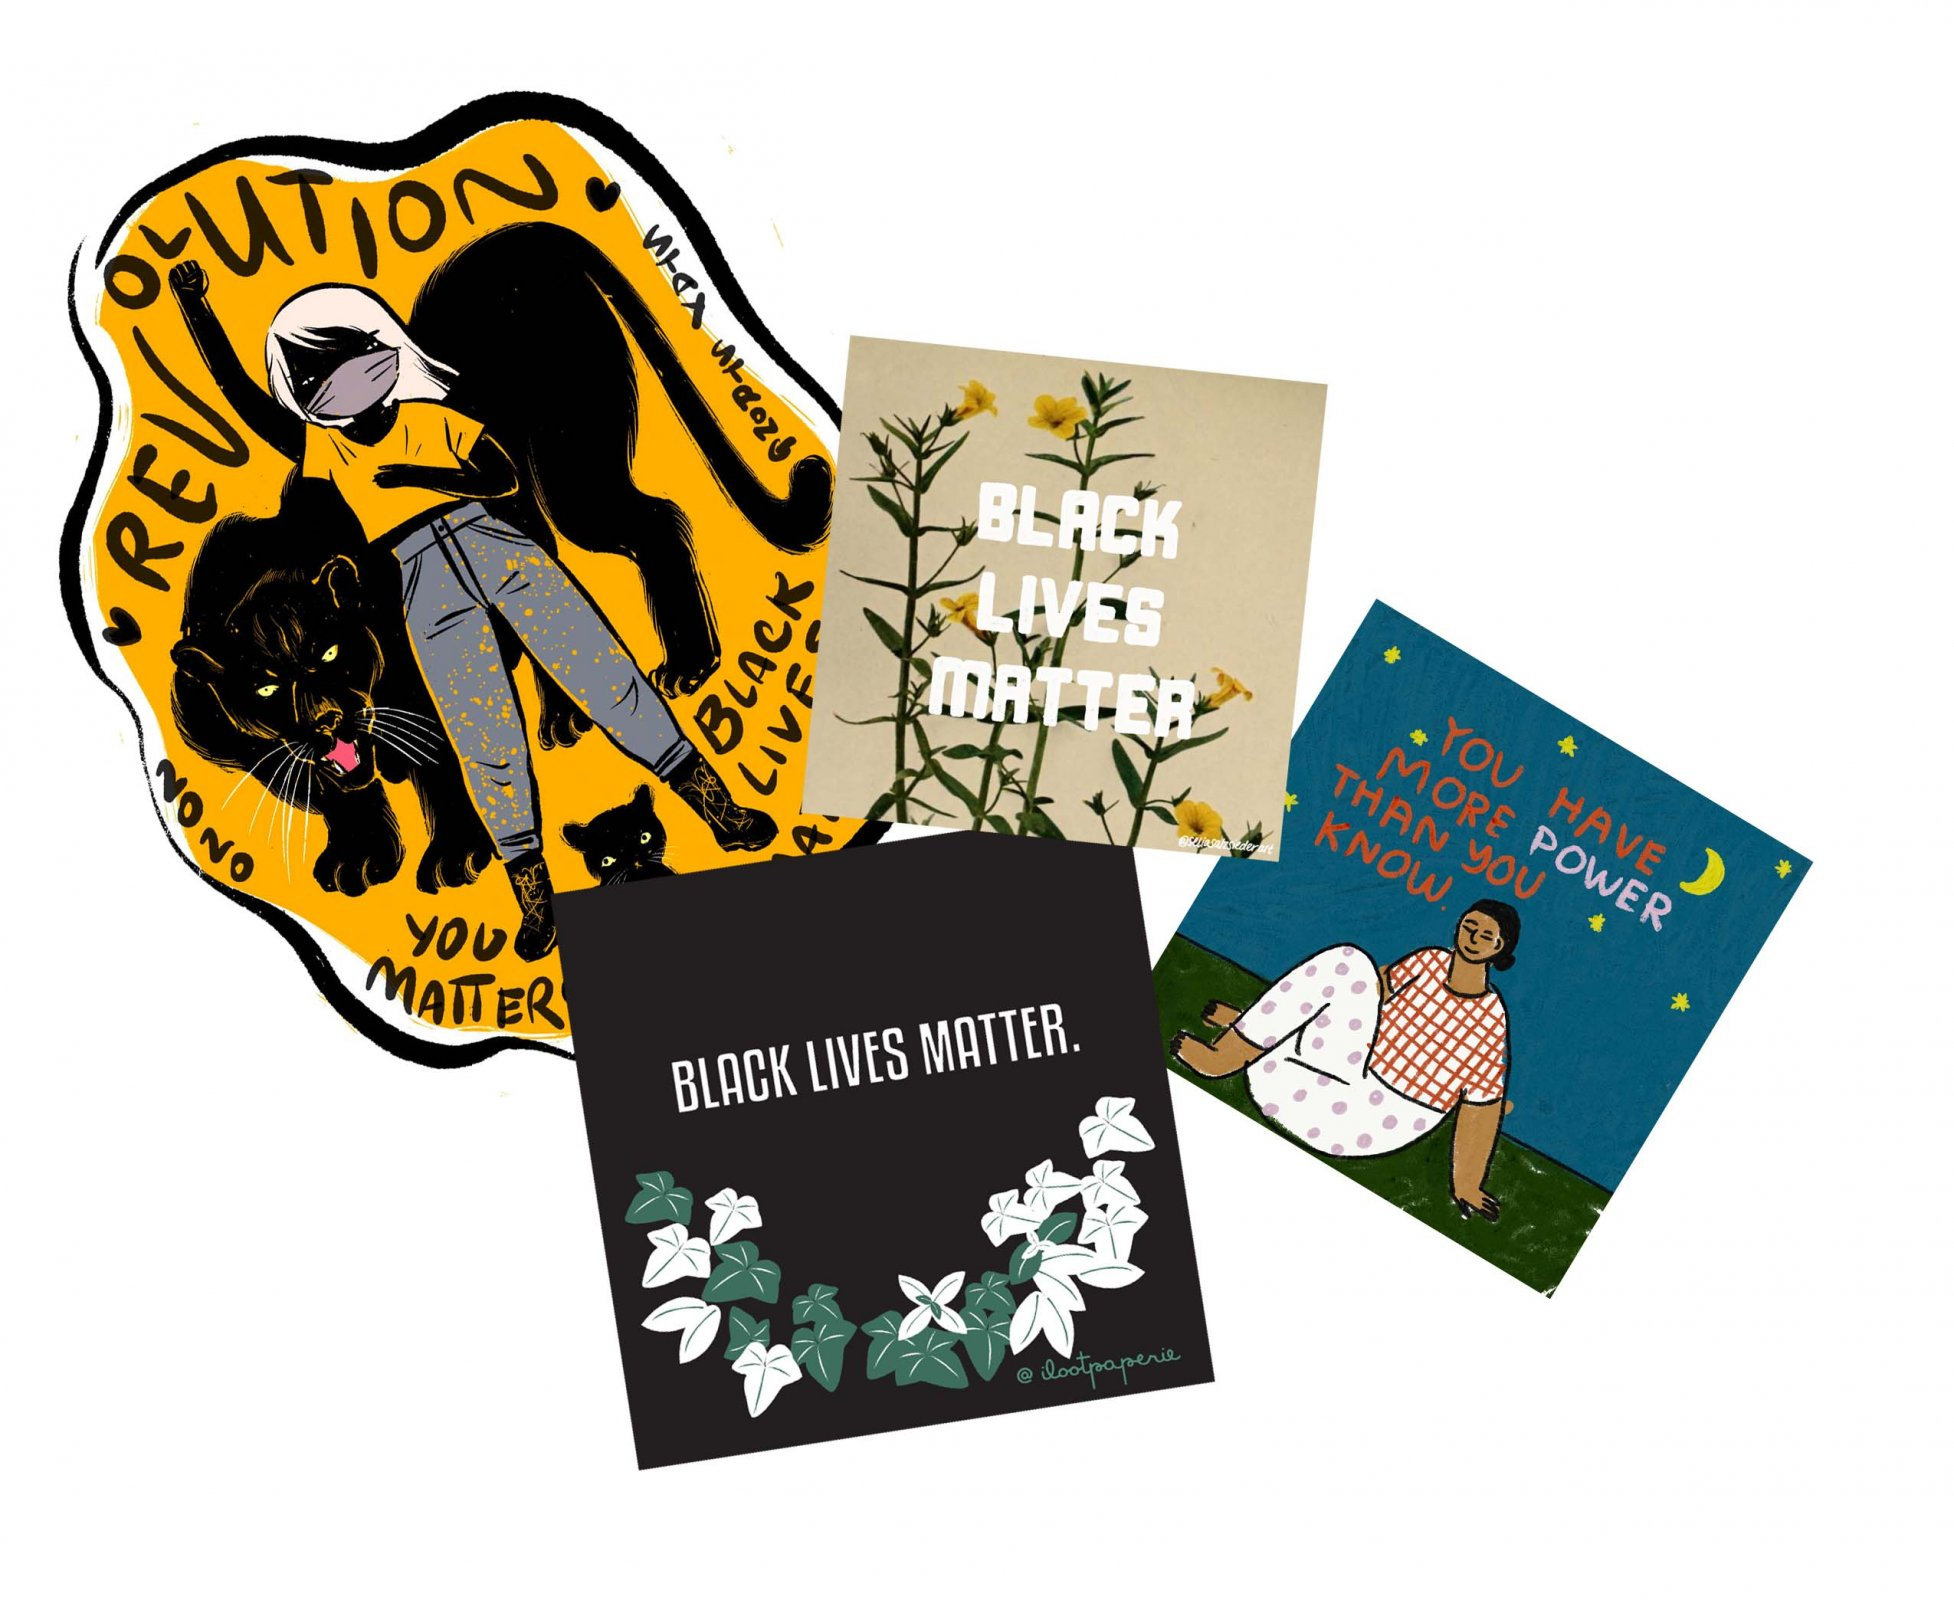 Black Lives Matter sticker set